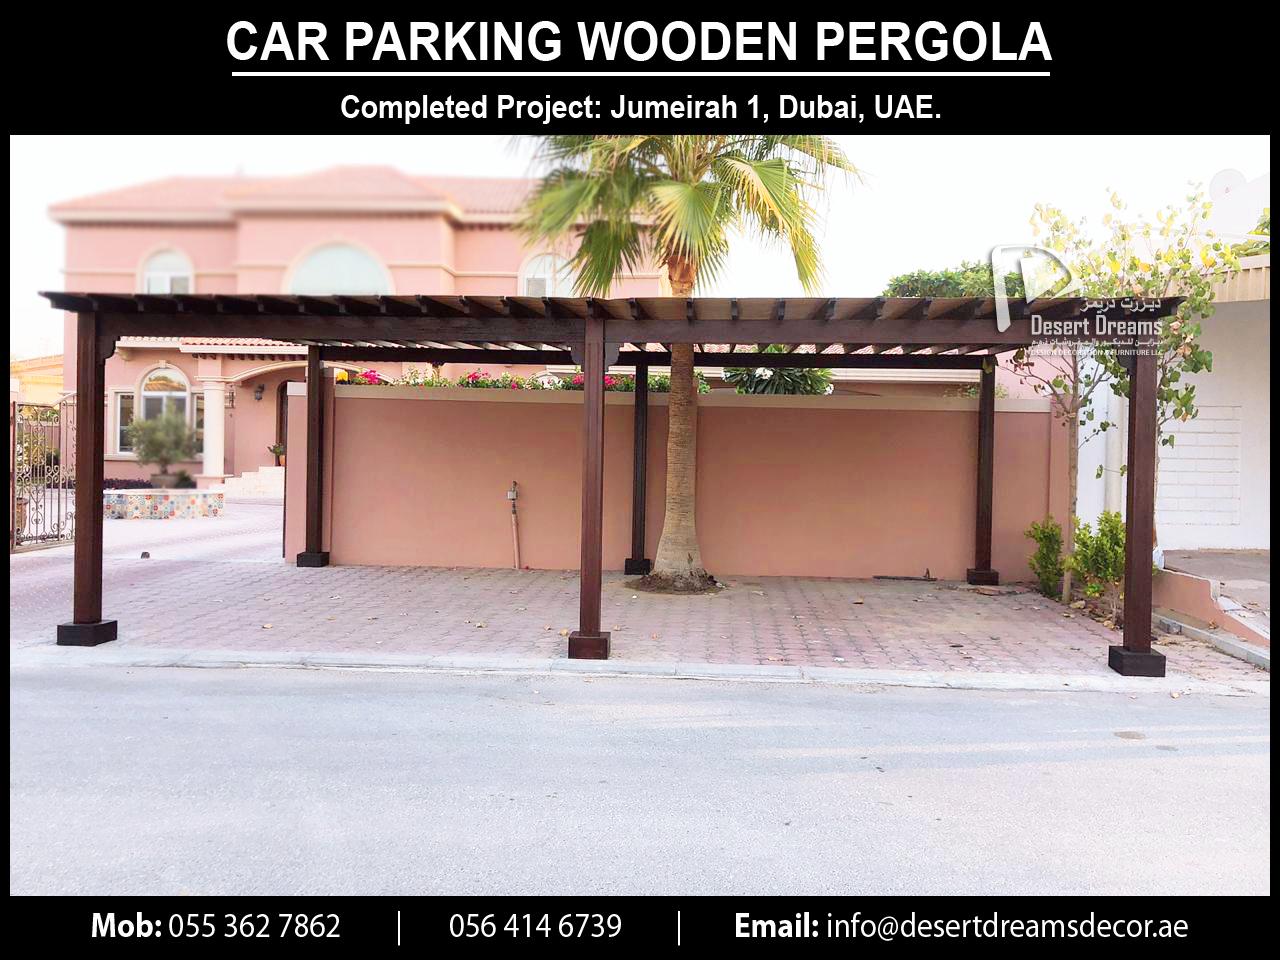 Car Parking Wooden Pergola UAE_Pergola Images_Desert Dreams (3).jpg